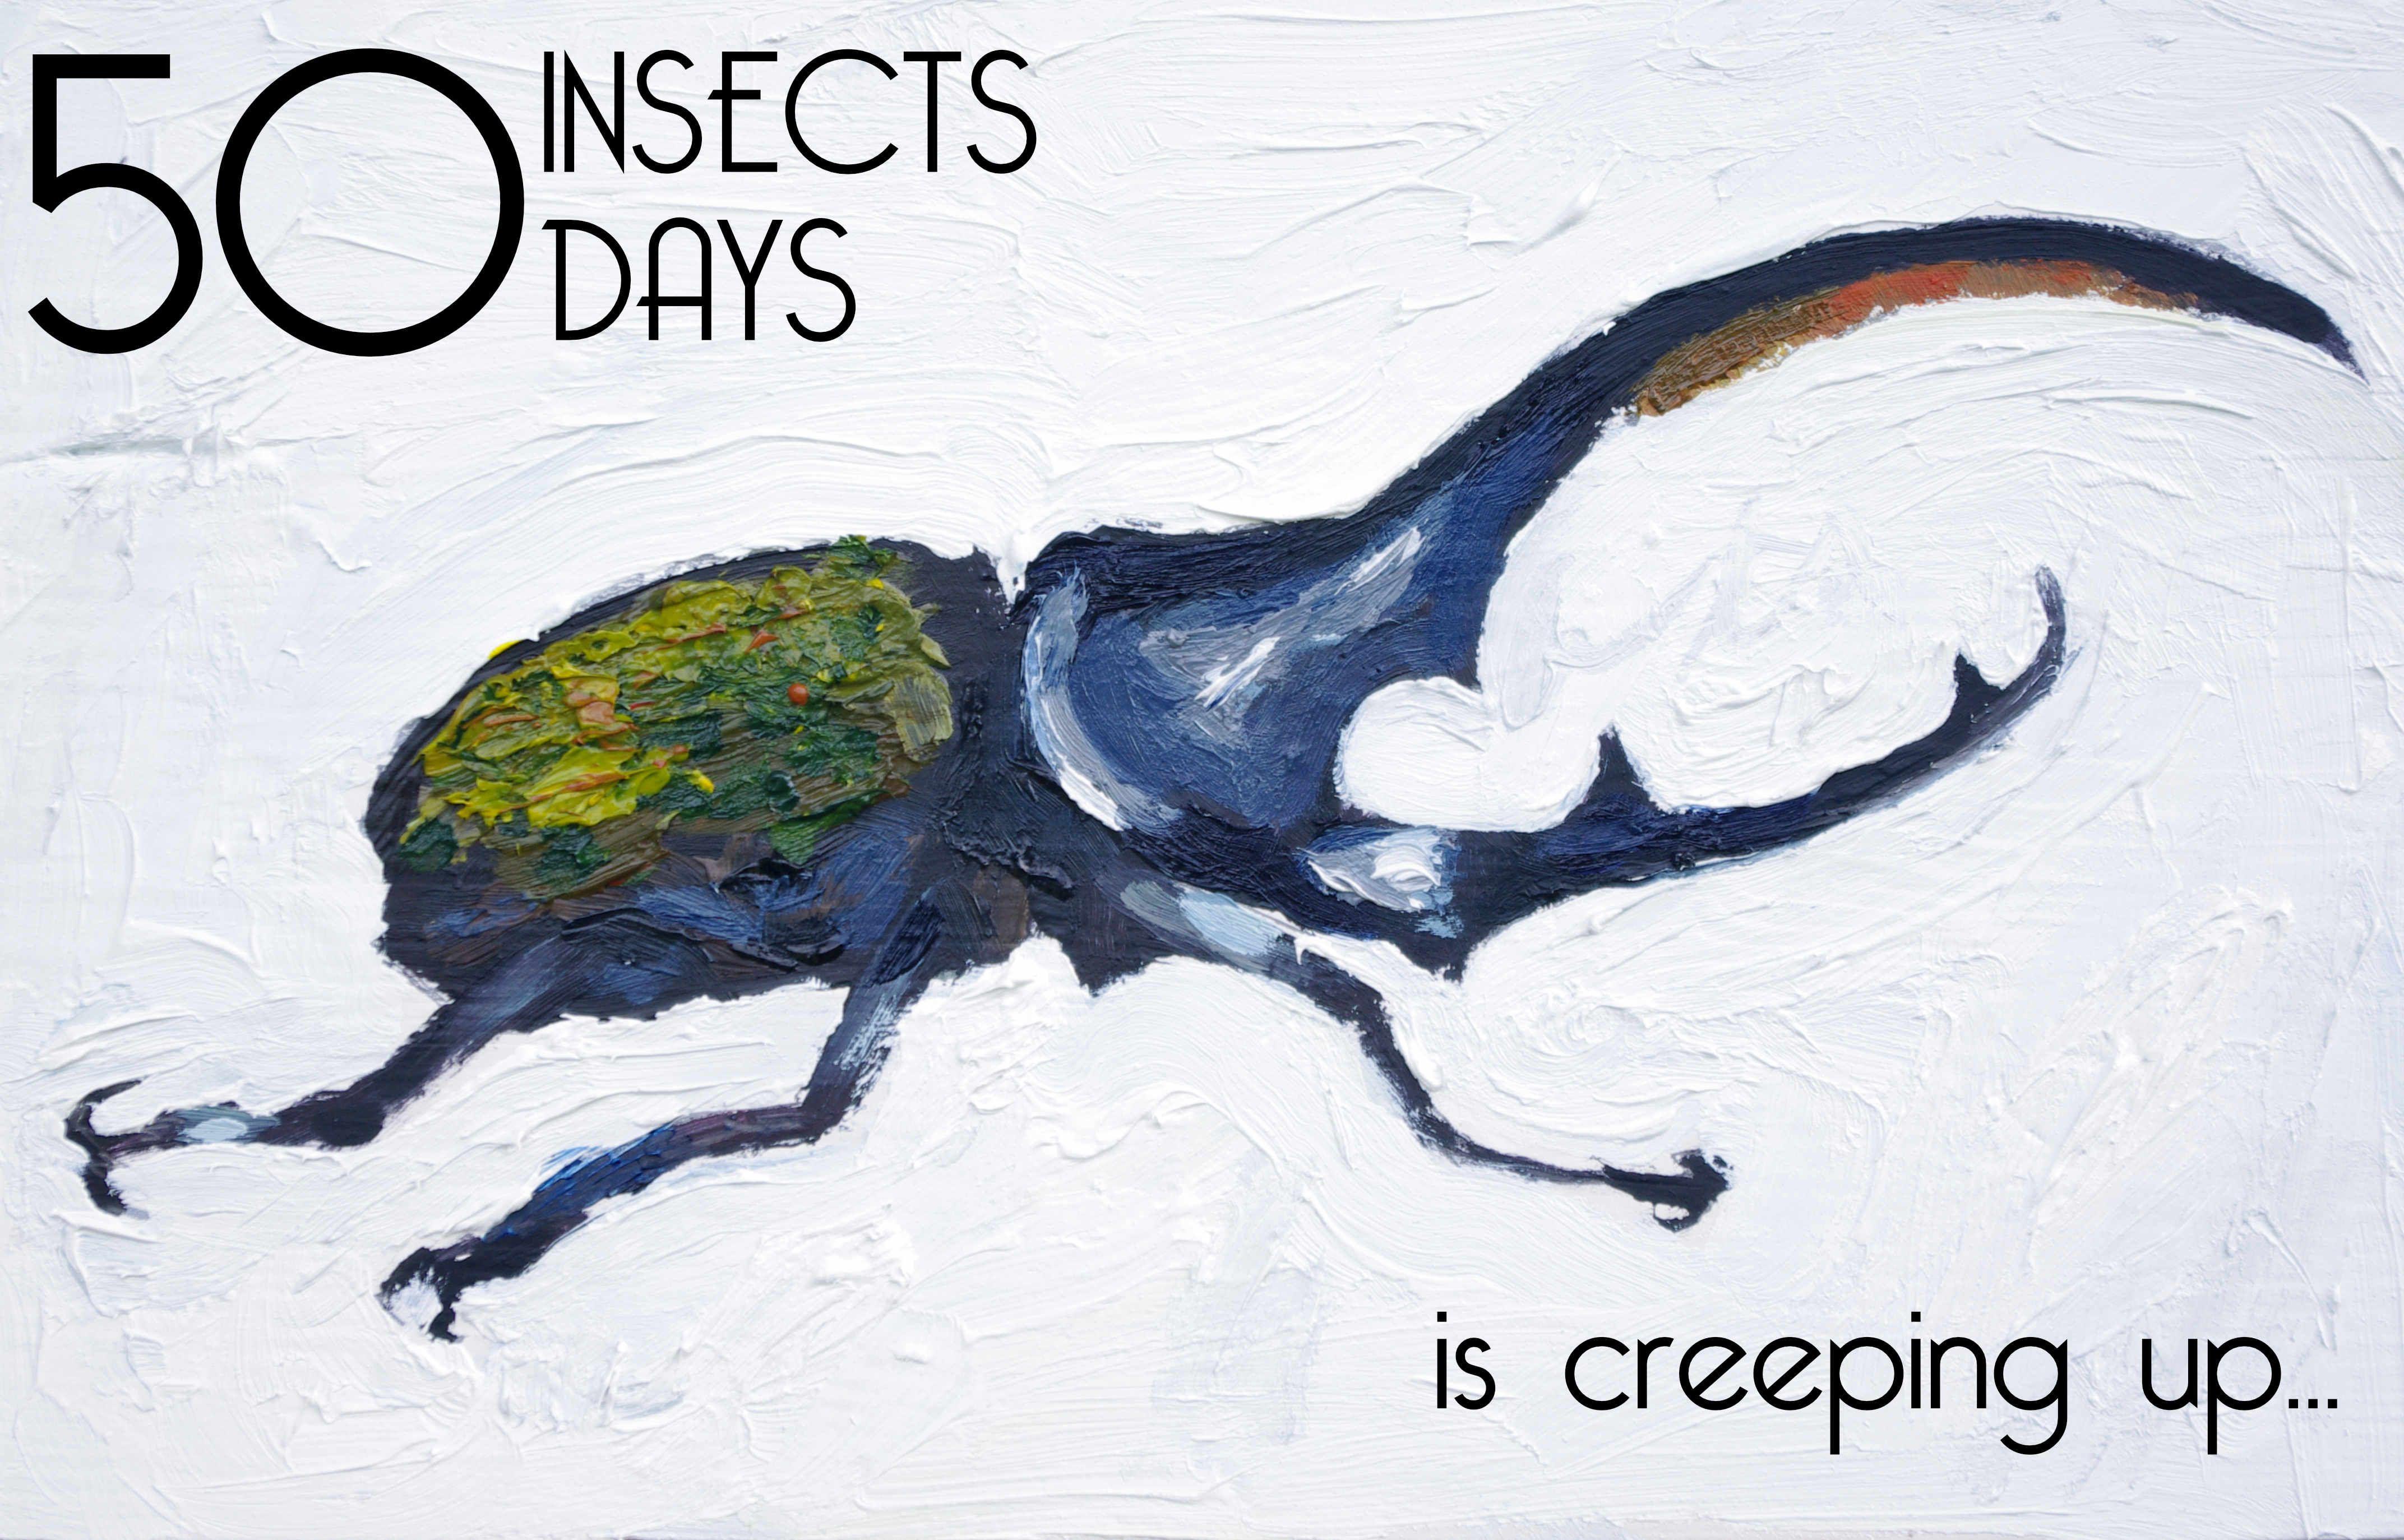 Hercules Beetle 50 insects animal artist painting wildlife art Will Eskridge